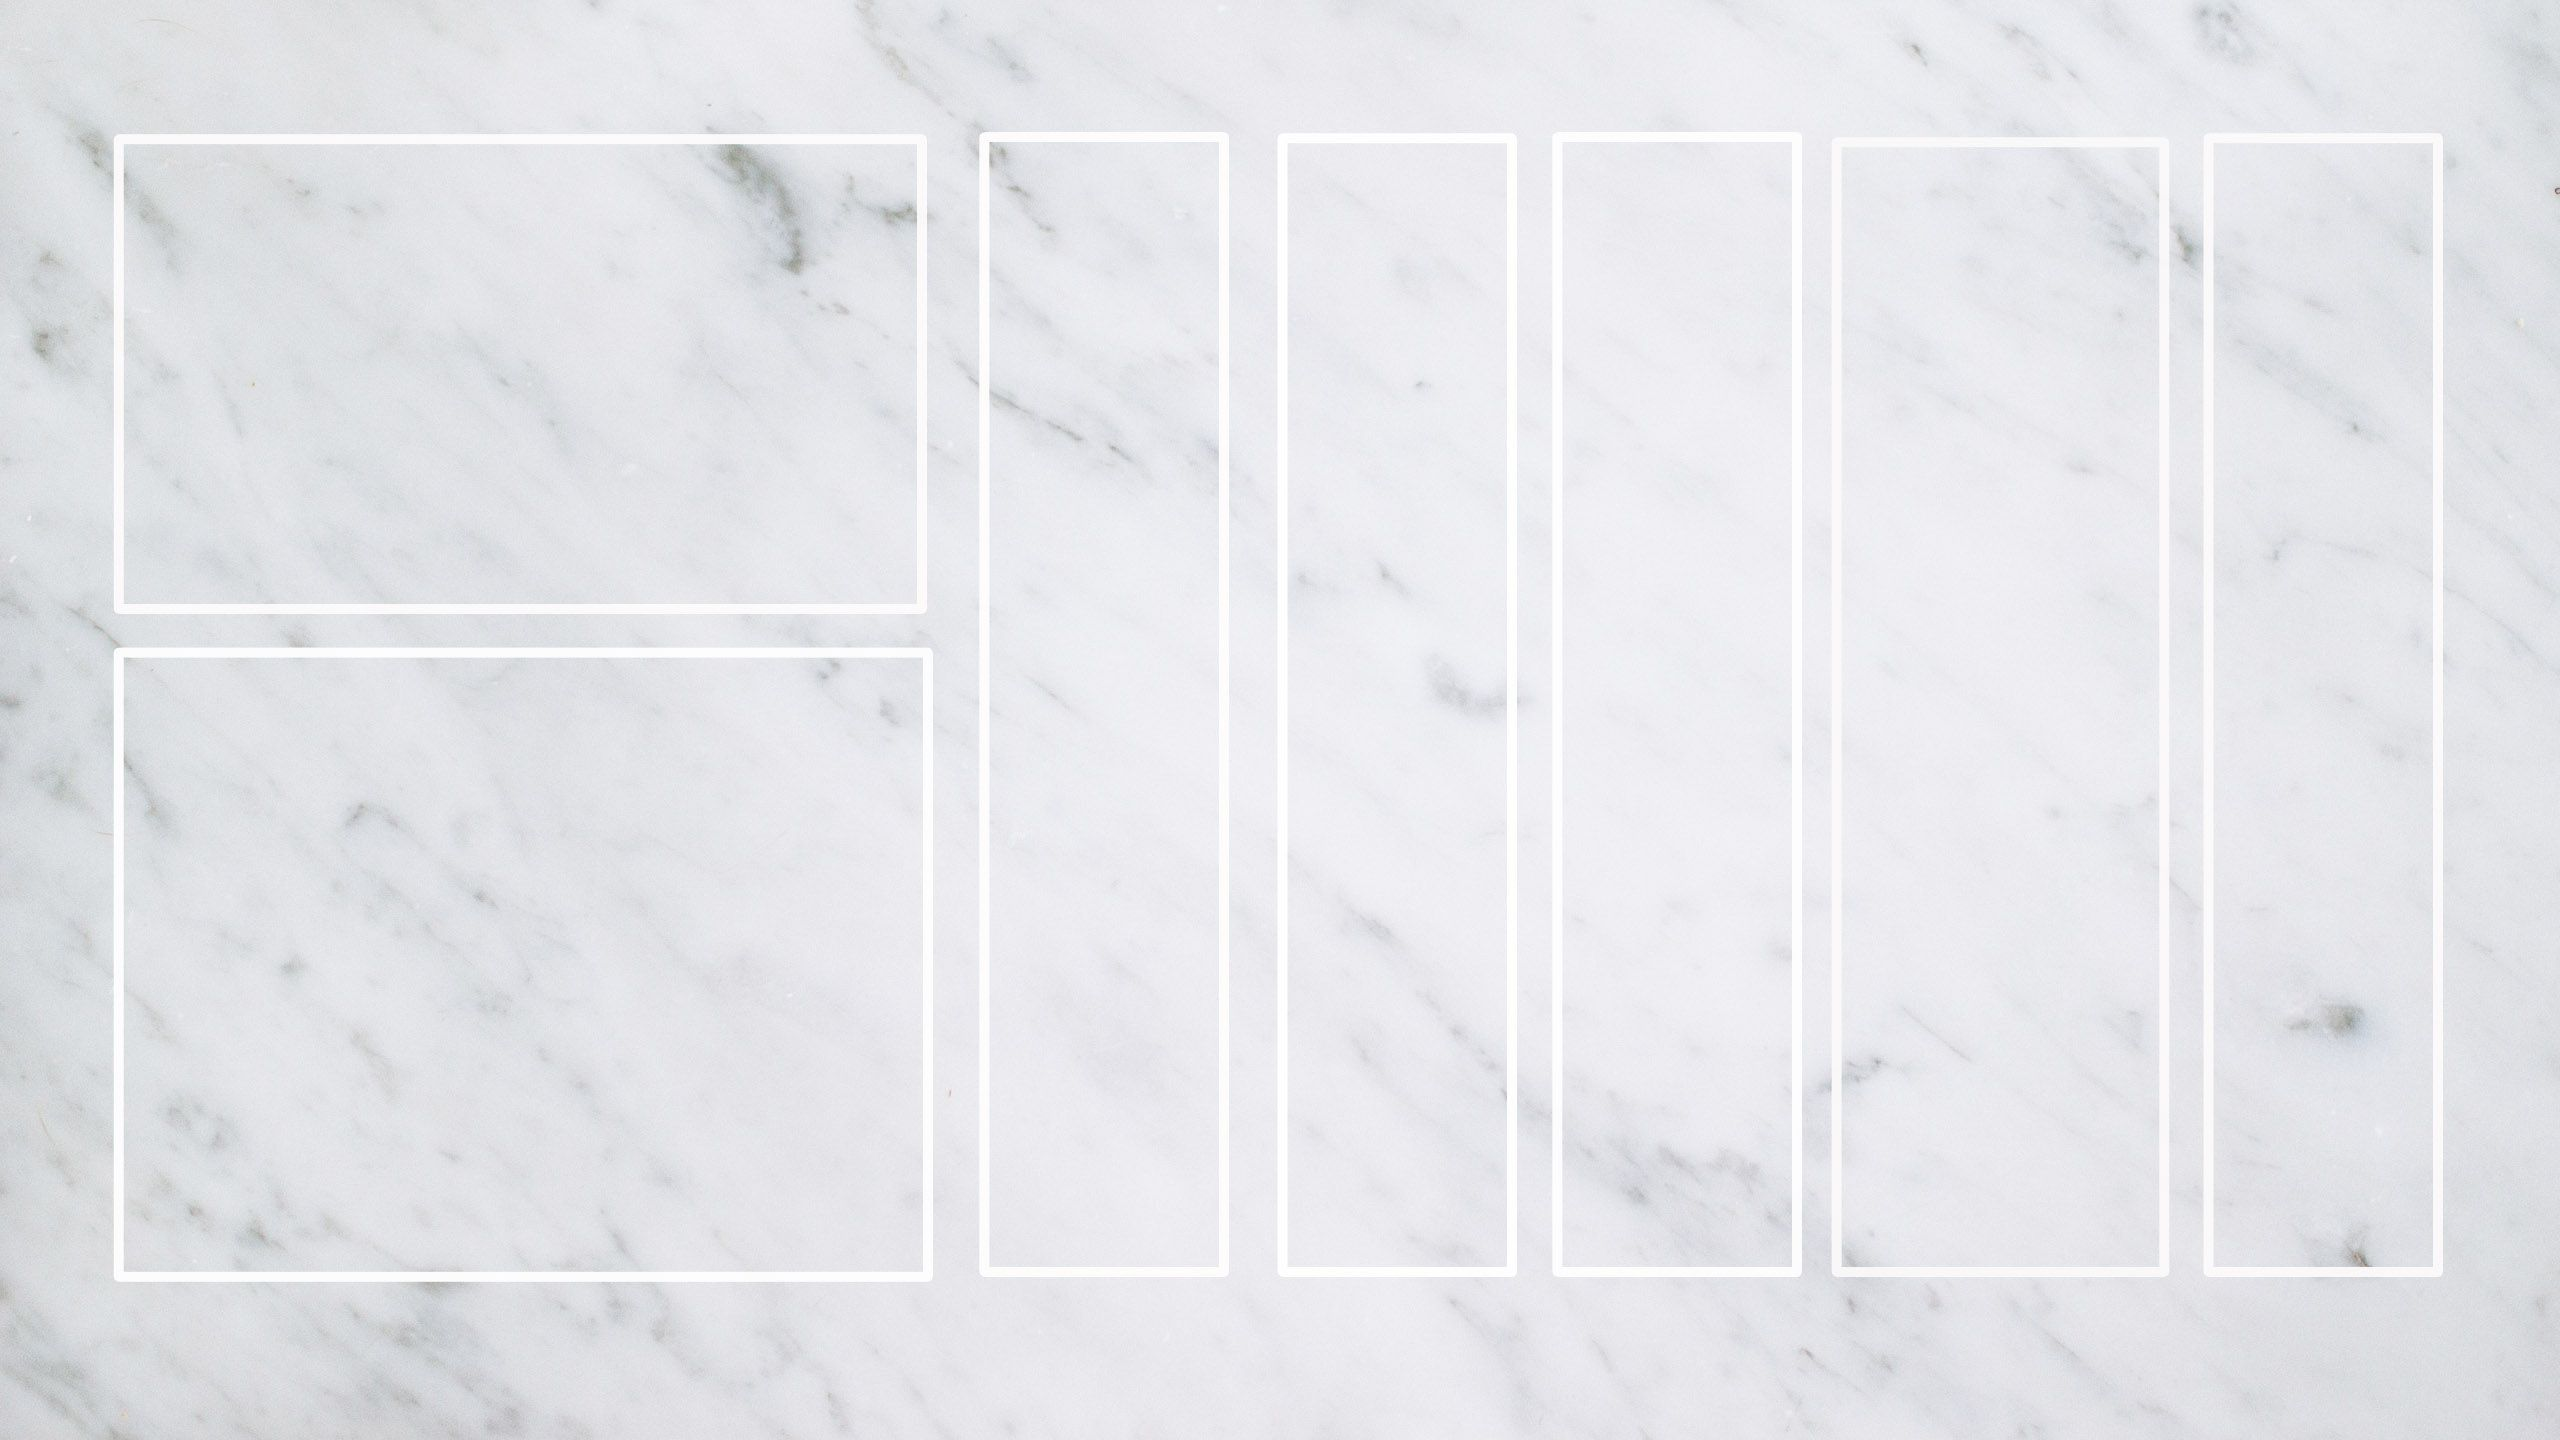 Grey White Blank Marble Desktop Organizer Wallpaper